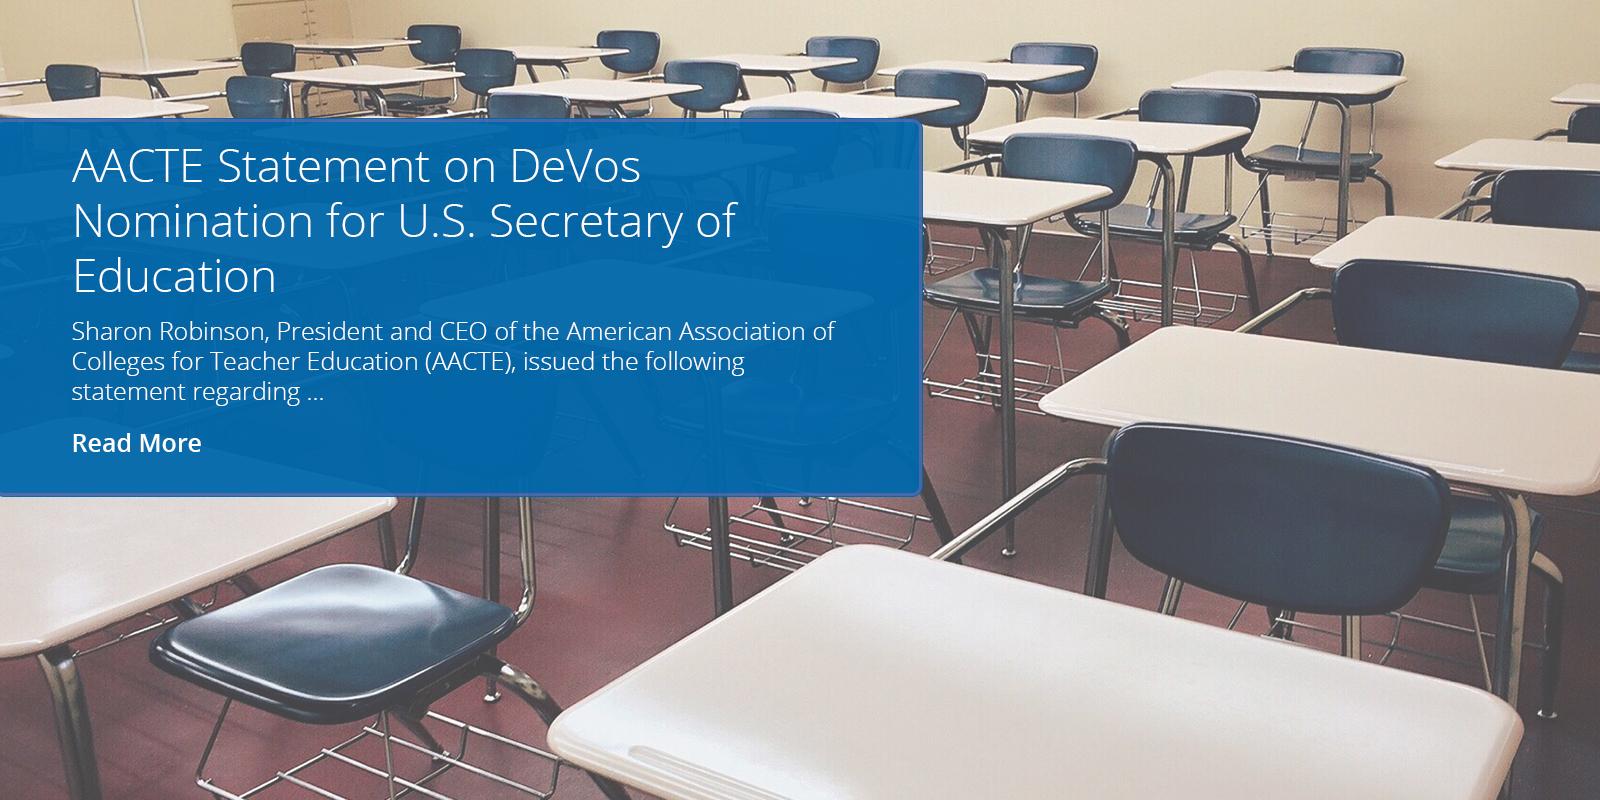 AACTE Statement on DeVos Nomination for U.S. Secretary of Education